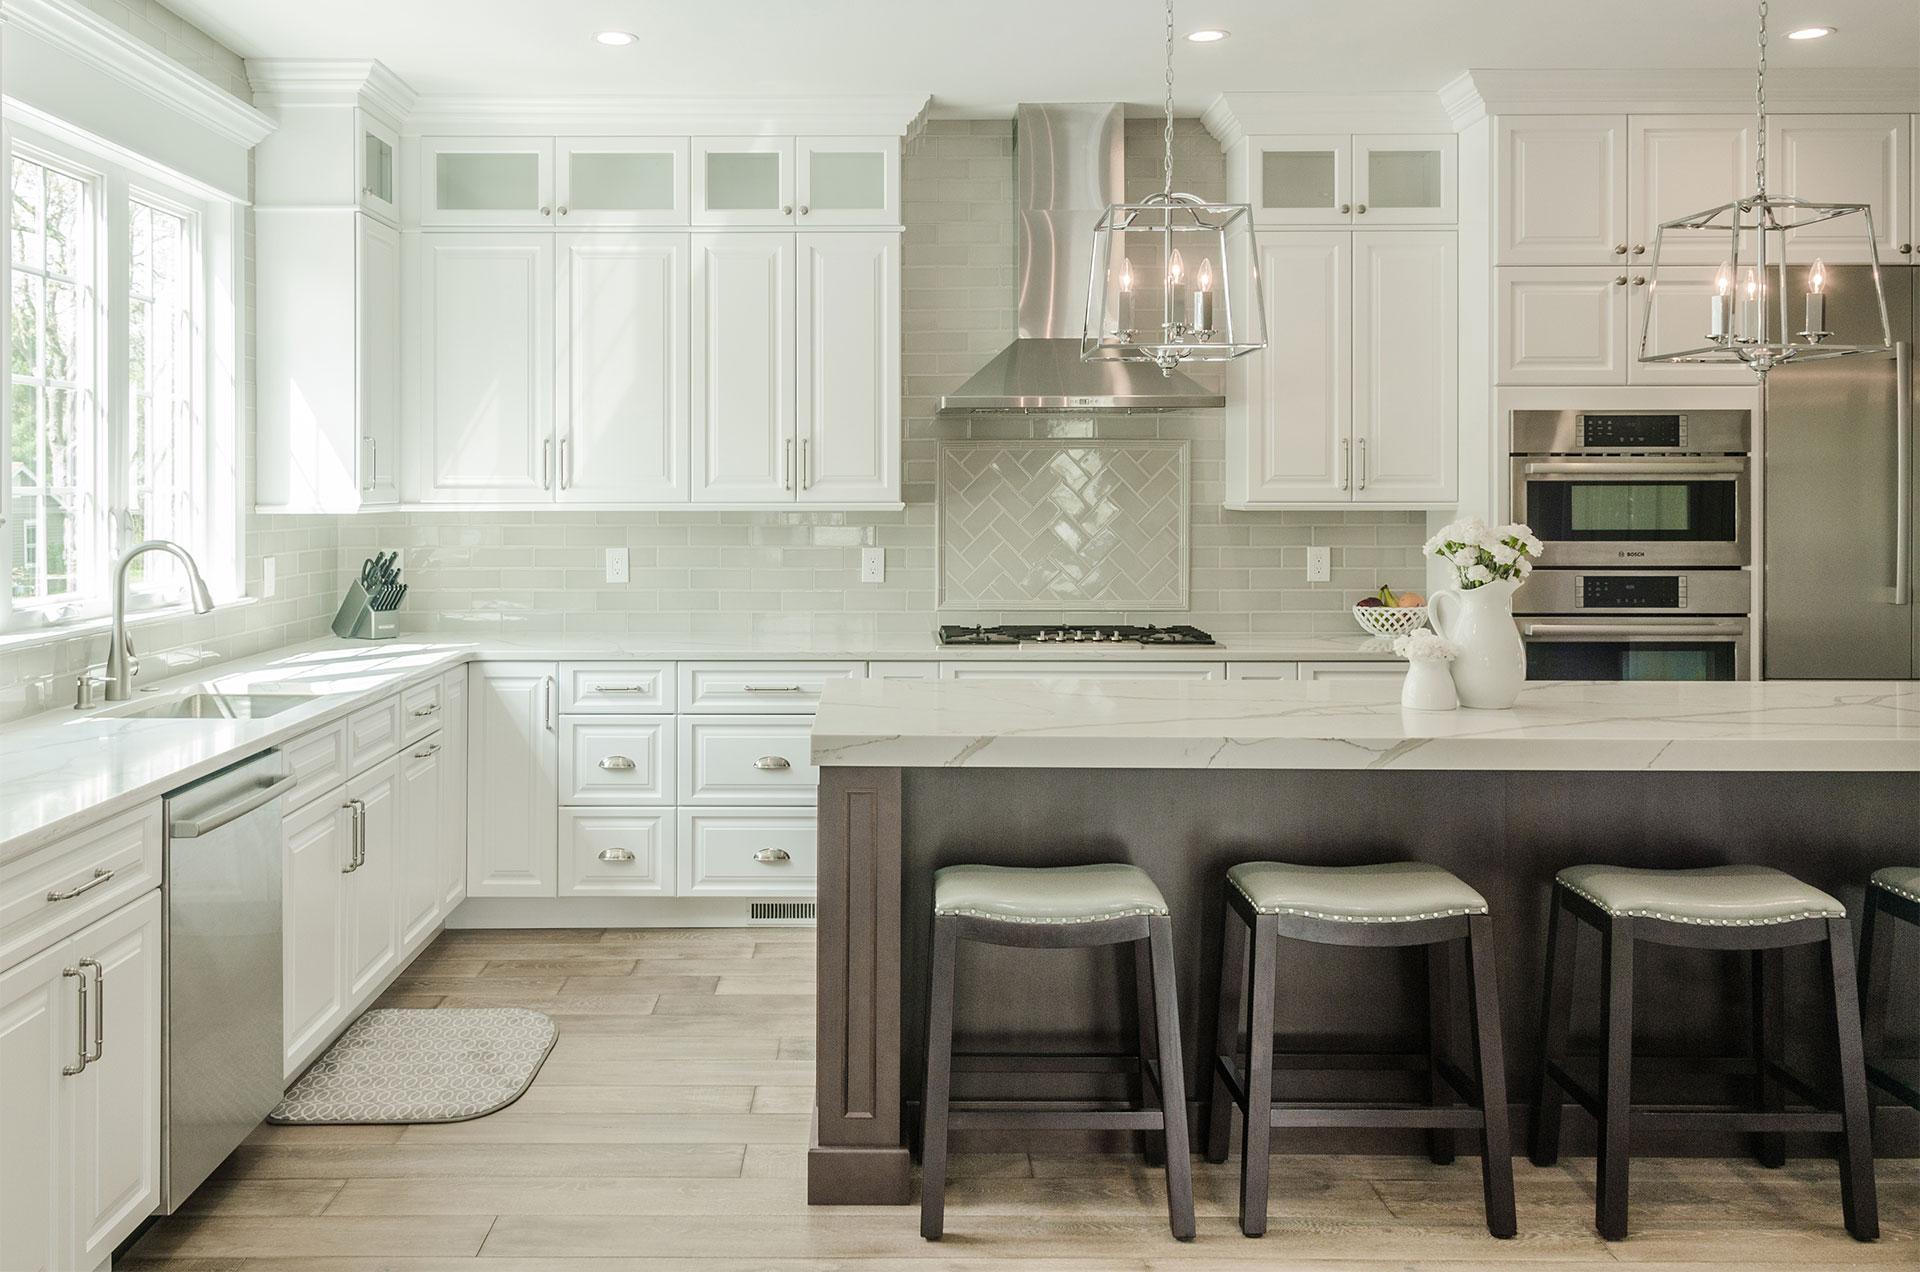 Colmar Kitchen & Bath Studio Margate NJ & Avalon NJ - Traditional ...